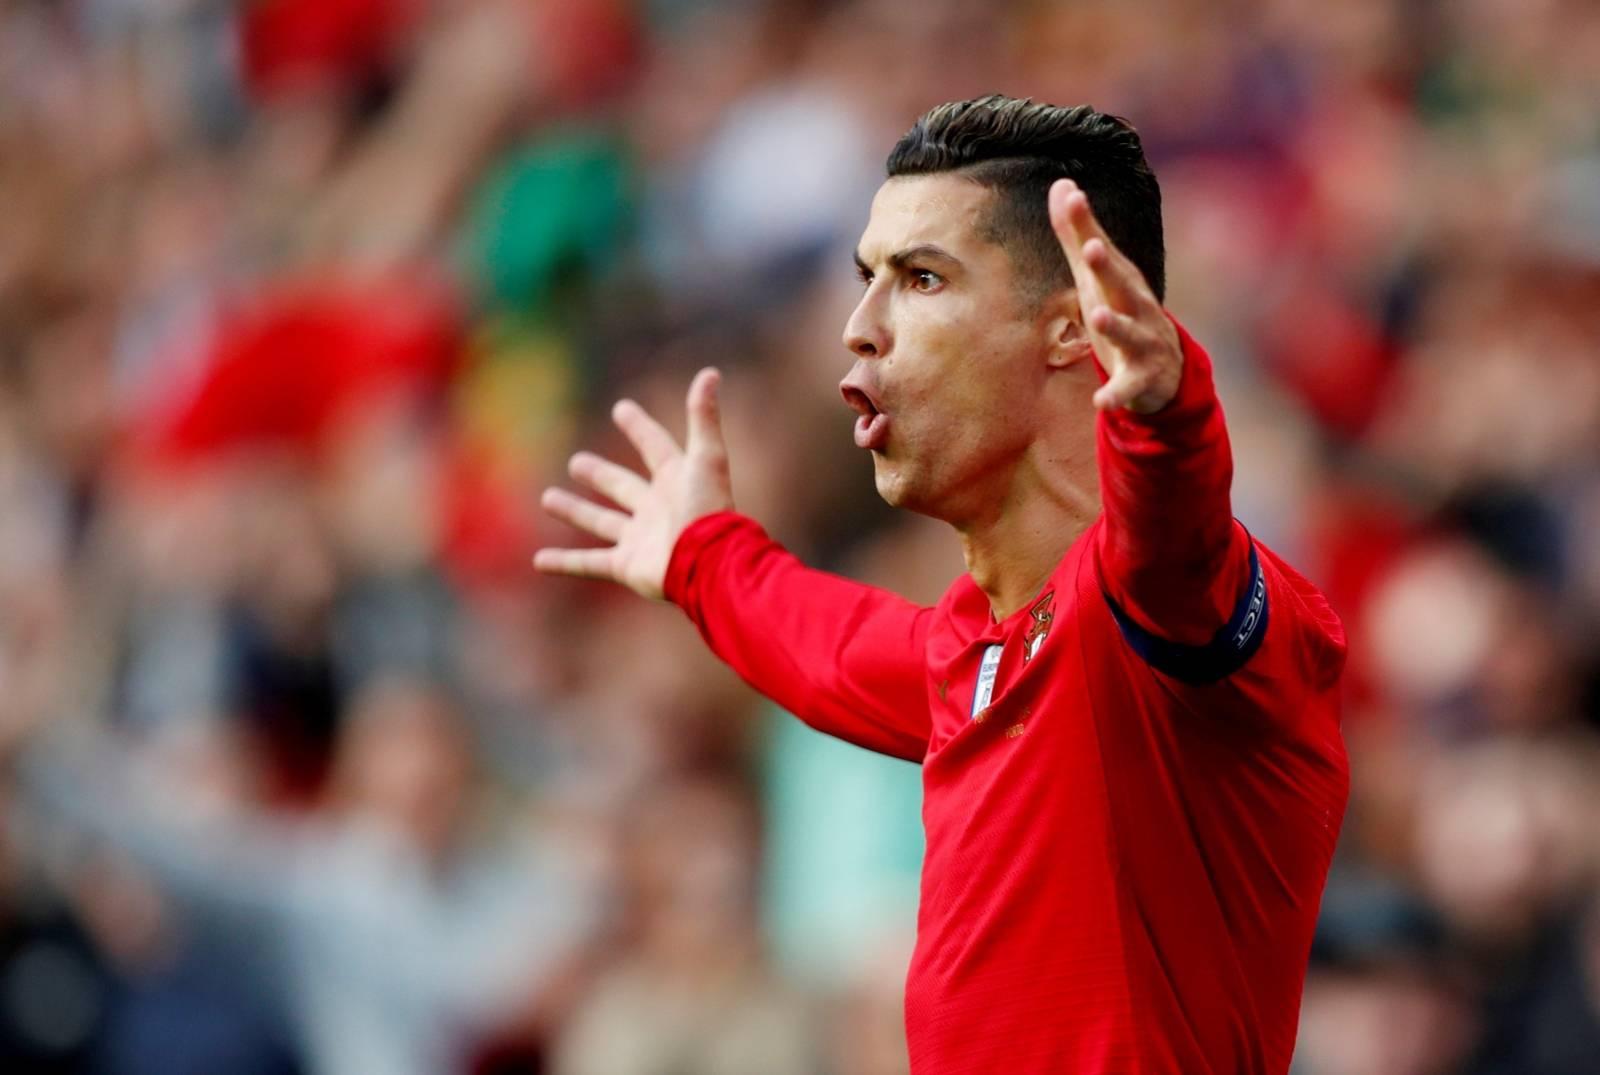 FILE PHOTO: Cristiano Ronaldo celebrates the first of his three goals in Portugal's 3-1 win over Switzerland in the UEFA Nations League semi-final at Estadio do Dragao in Porto.